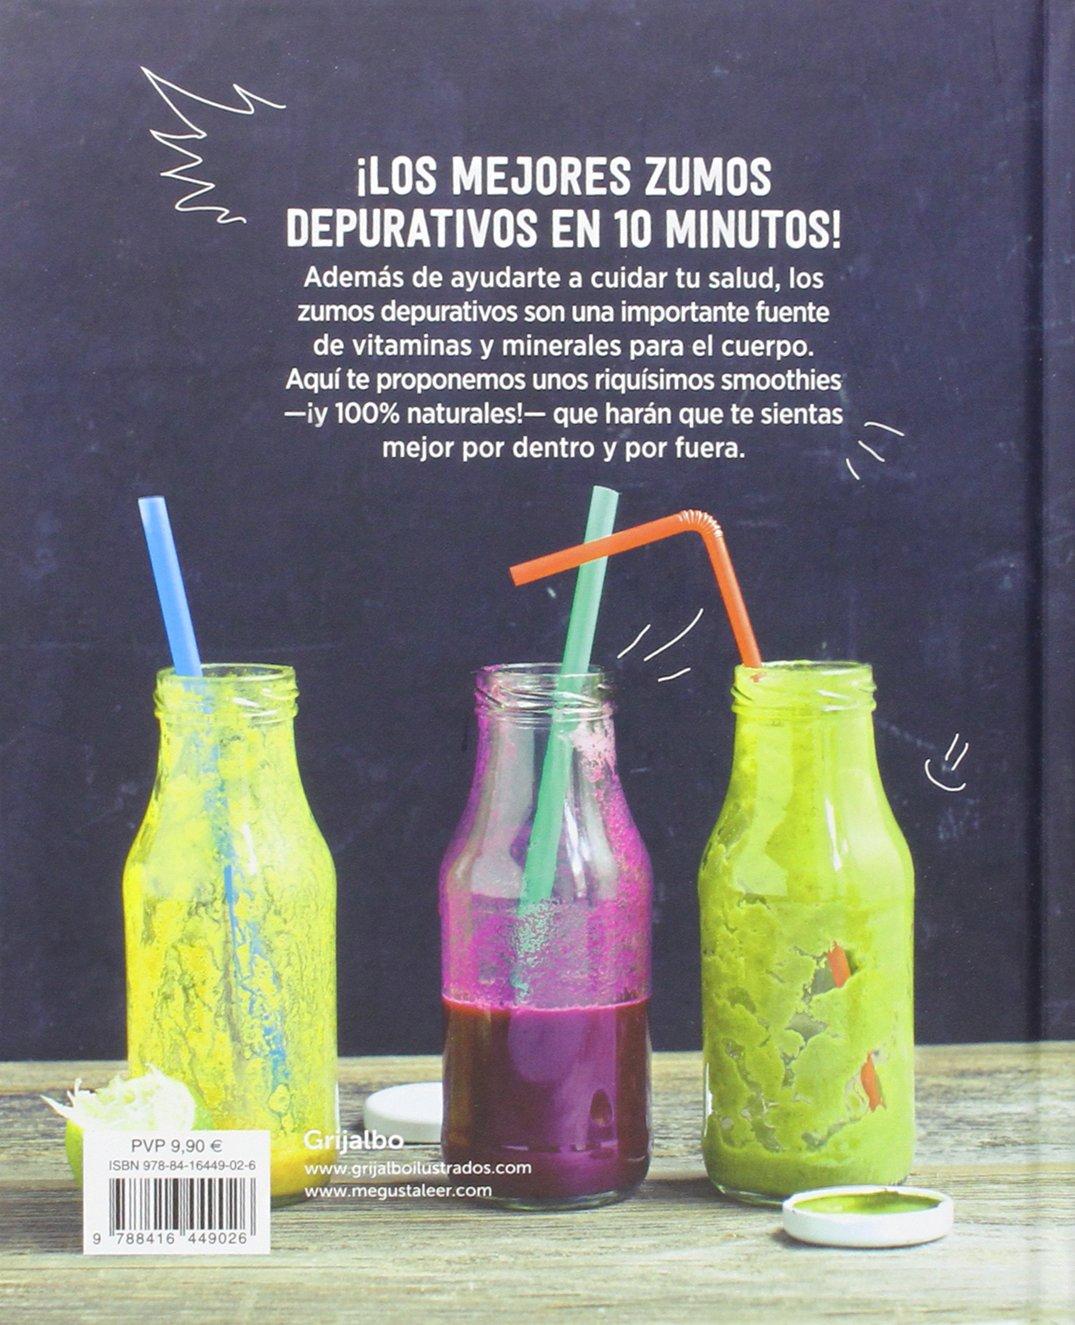 Los mejores zumos depurativos / Smoothies: The Best Juices For Detoxi ng (Spanish Edition): Irina Pawassar: 9788416449026: Amazon.com: Books